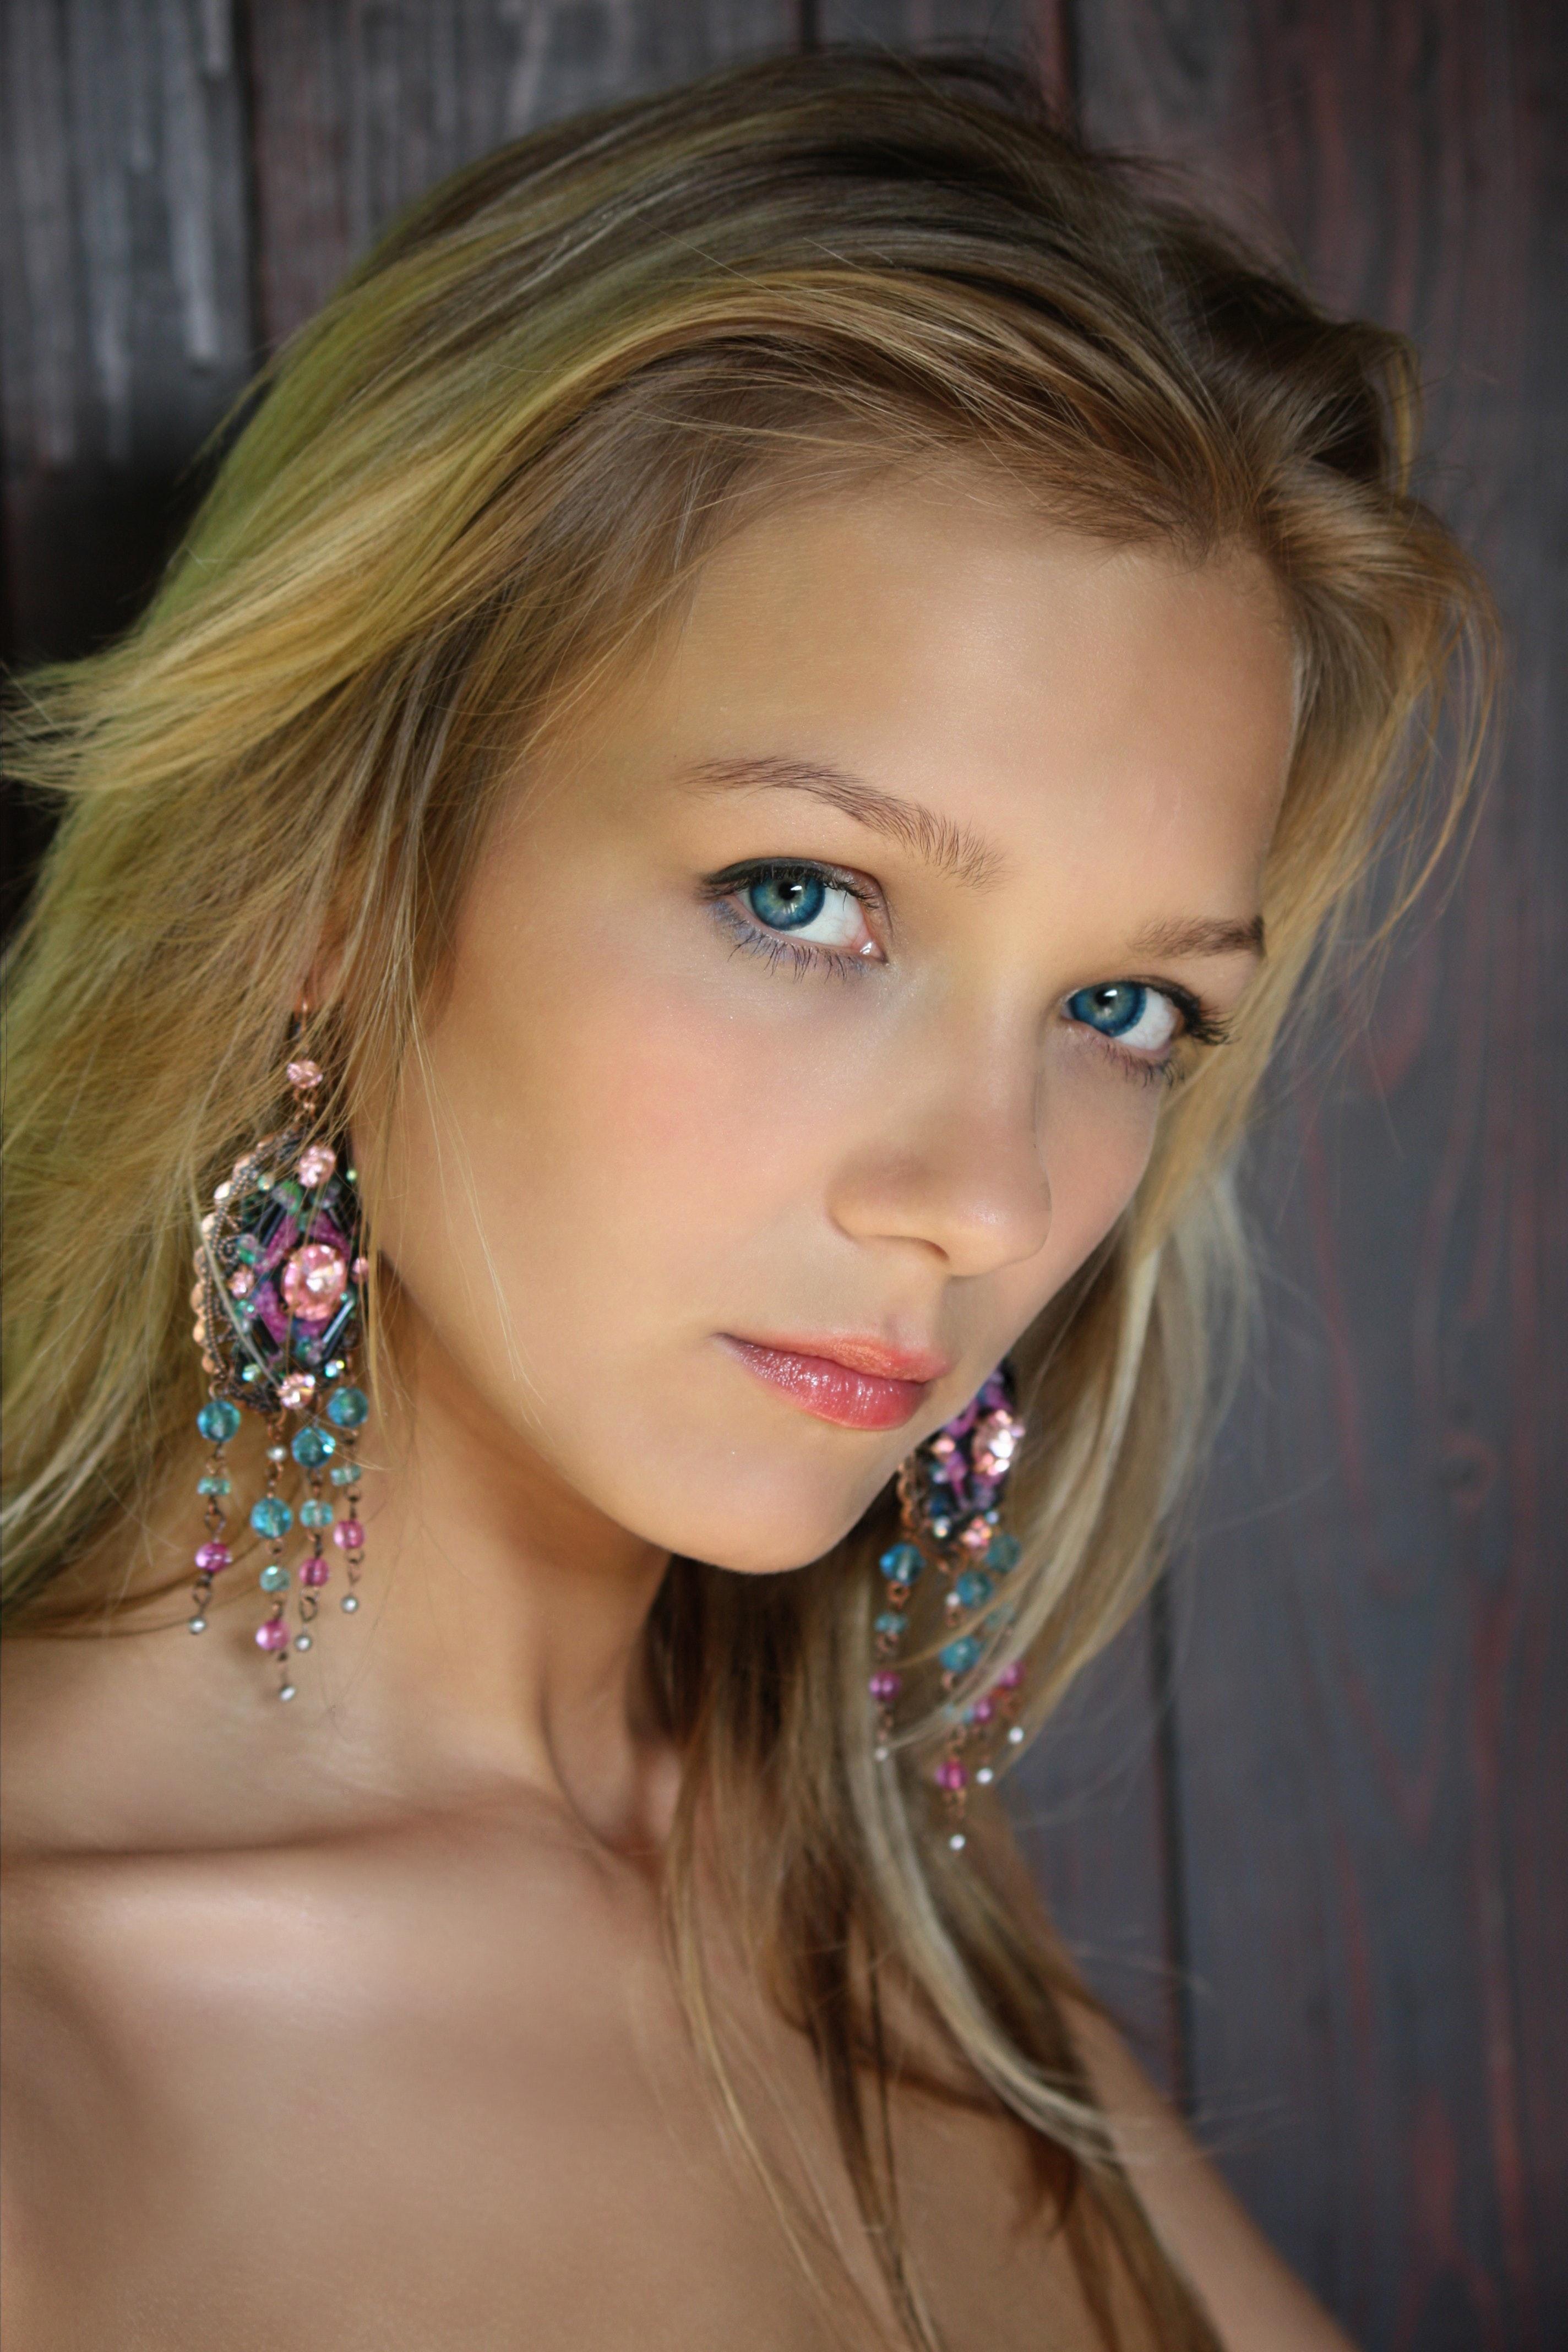 Bella Blond naked 195